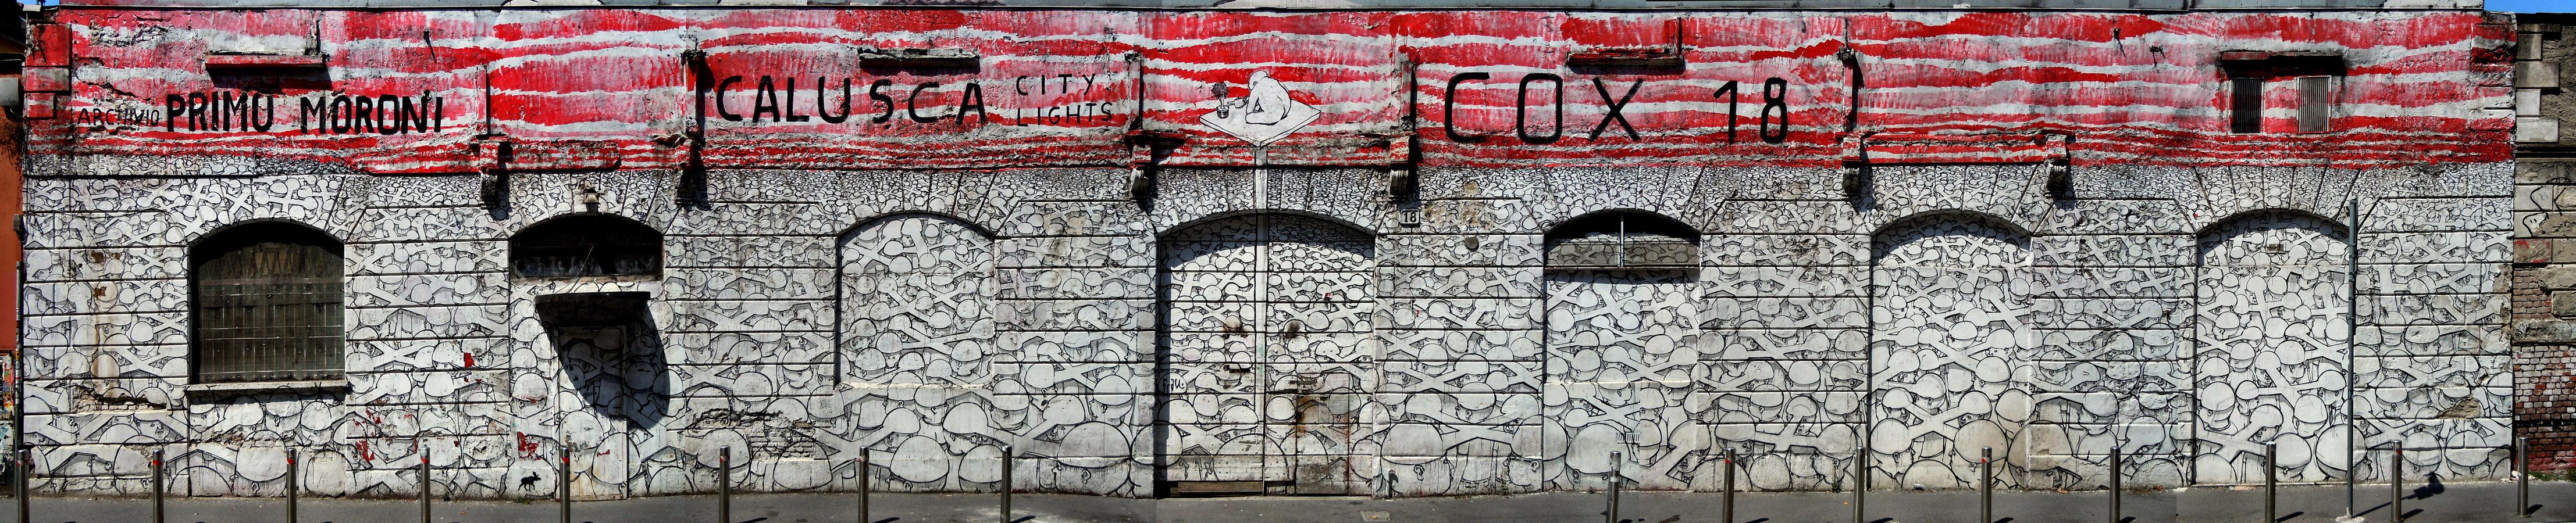 Street Art a Milano - Via Conchetta: www.thais.it/citta_italiane/Milano/Graffiti/Titano/Conchetta.htm